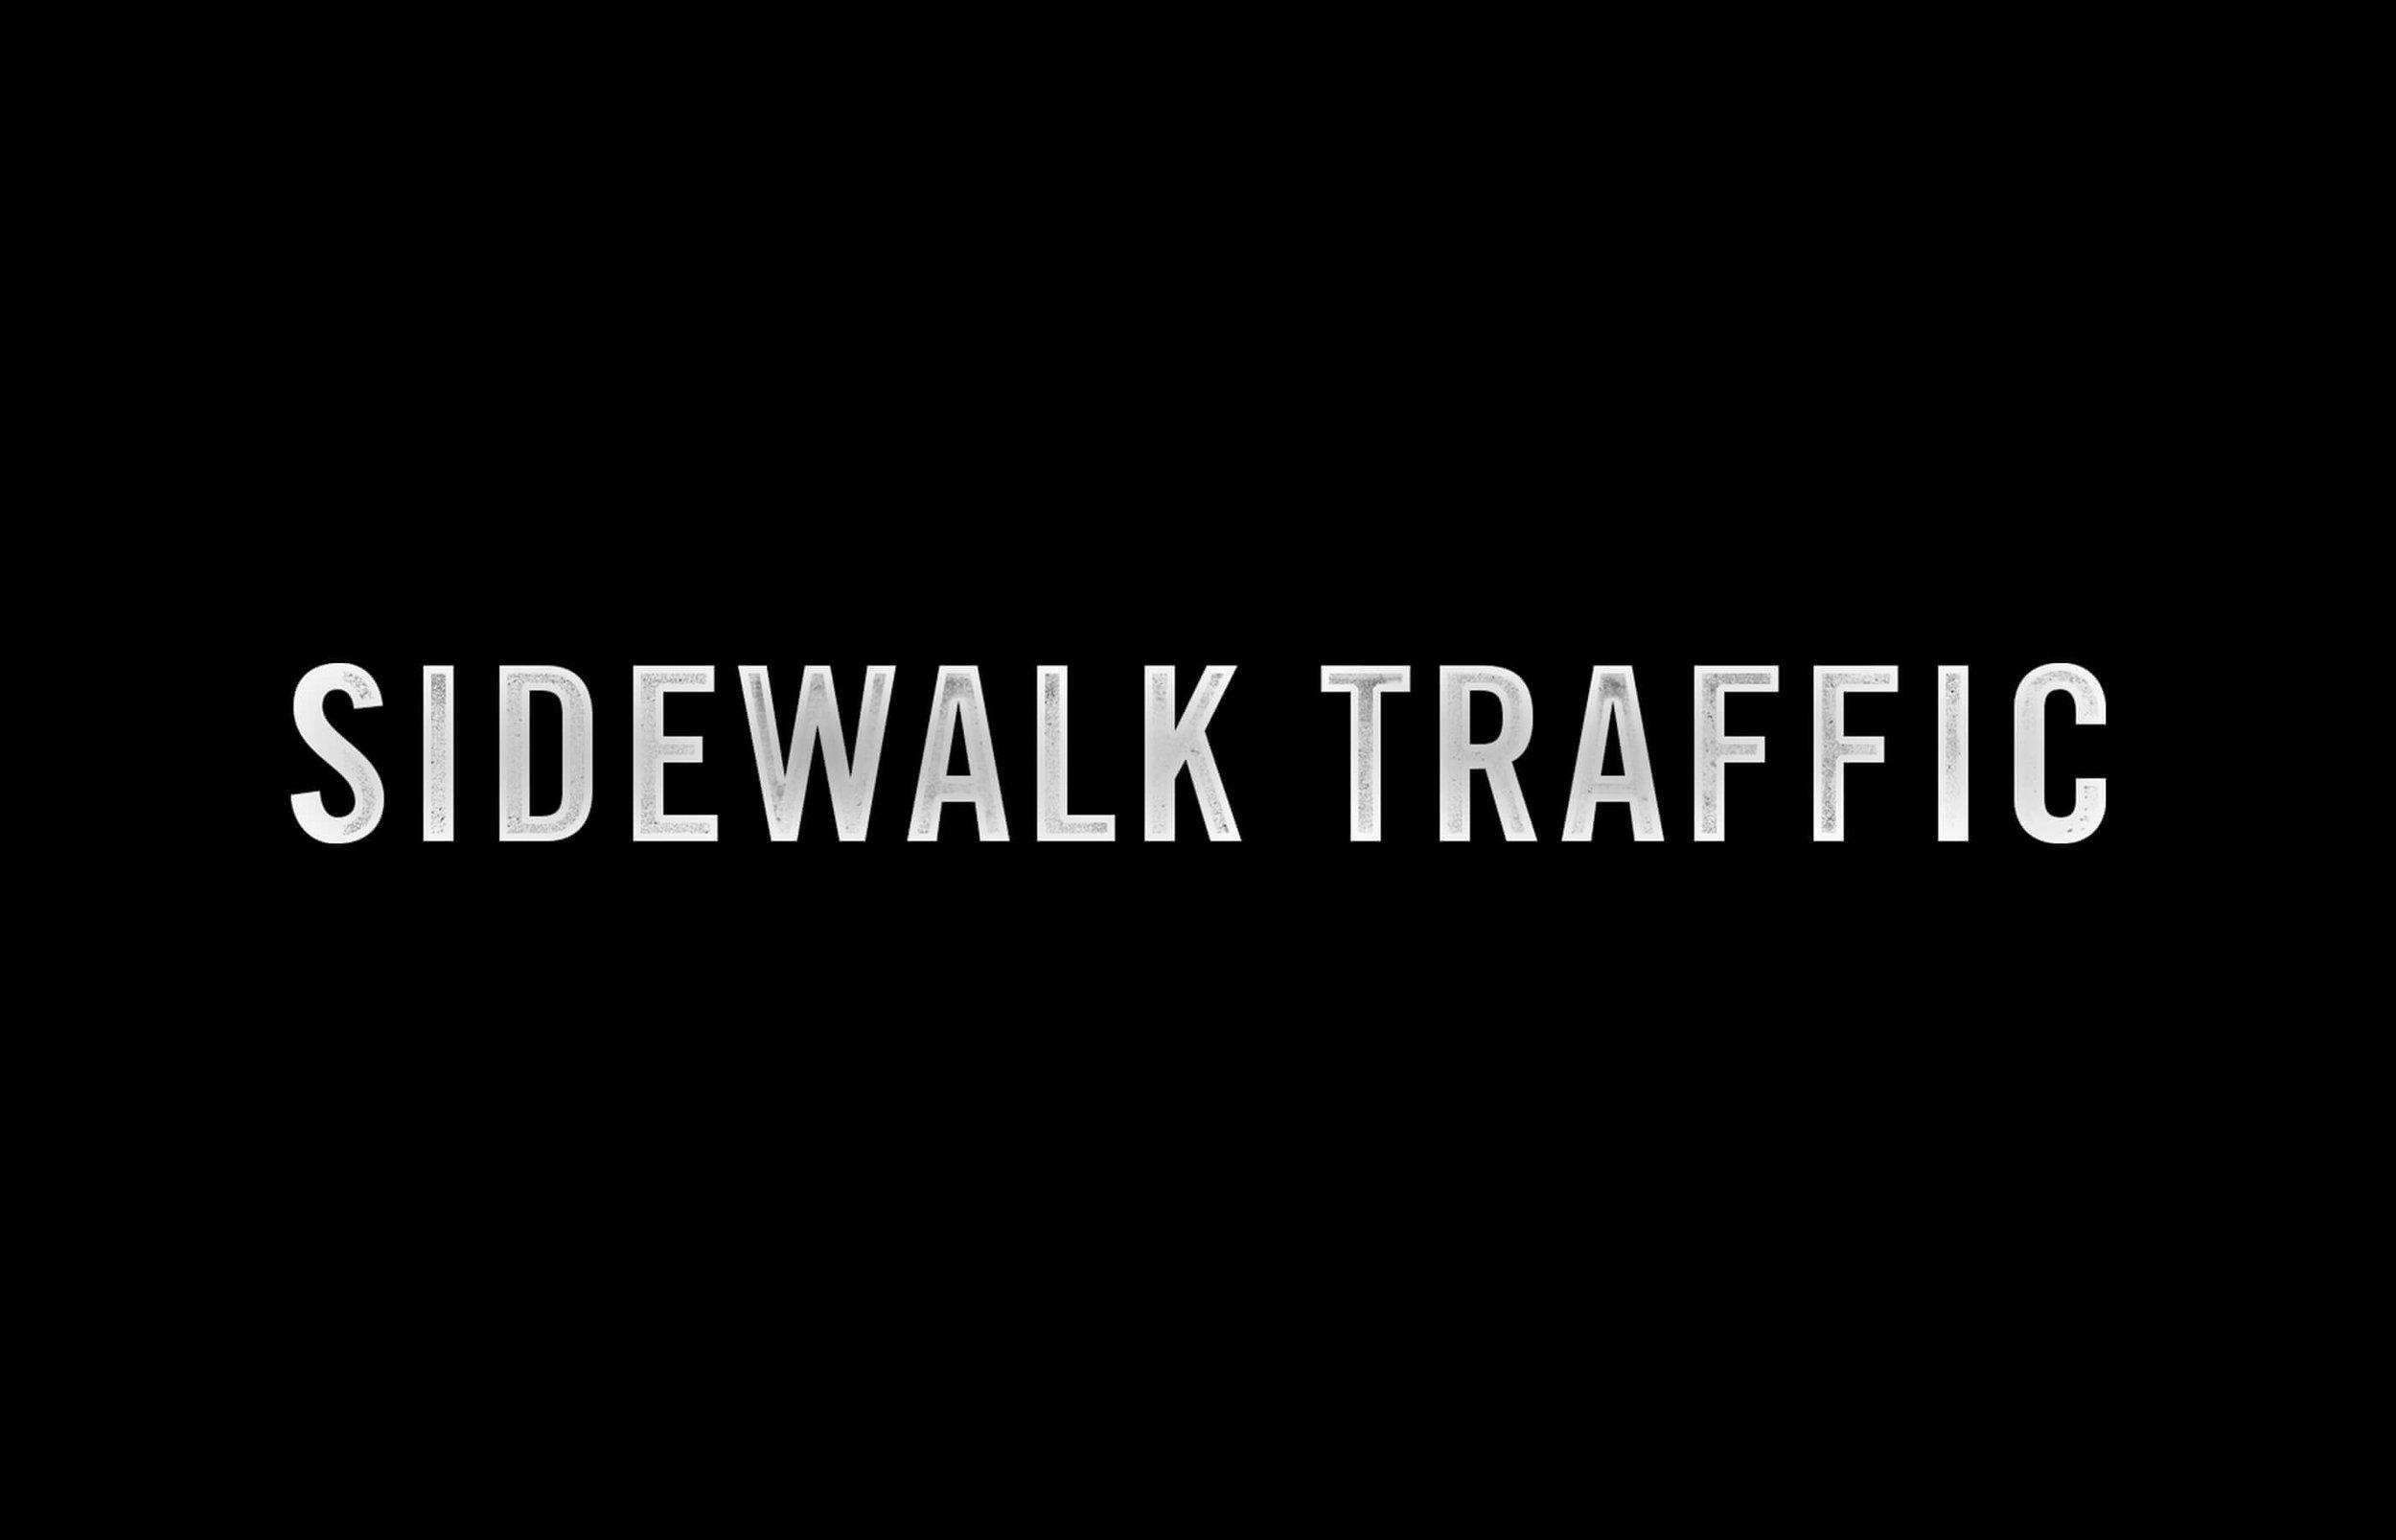 sidewalk-traffic-title–main_bw.jpg